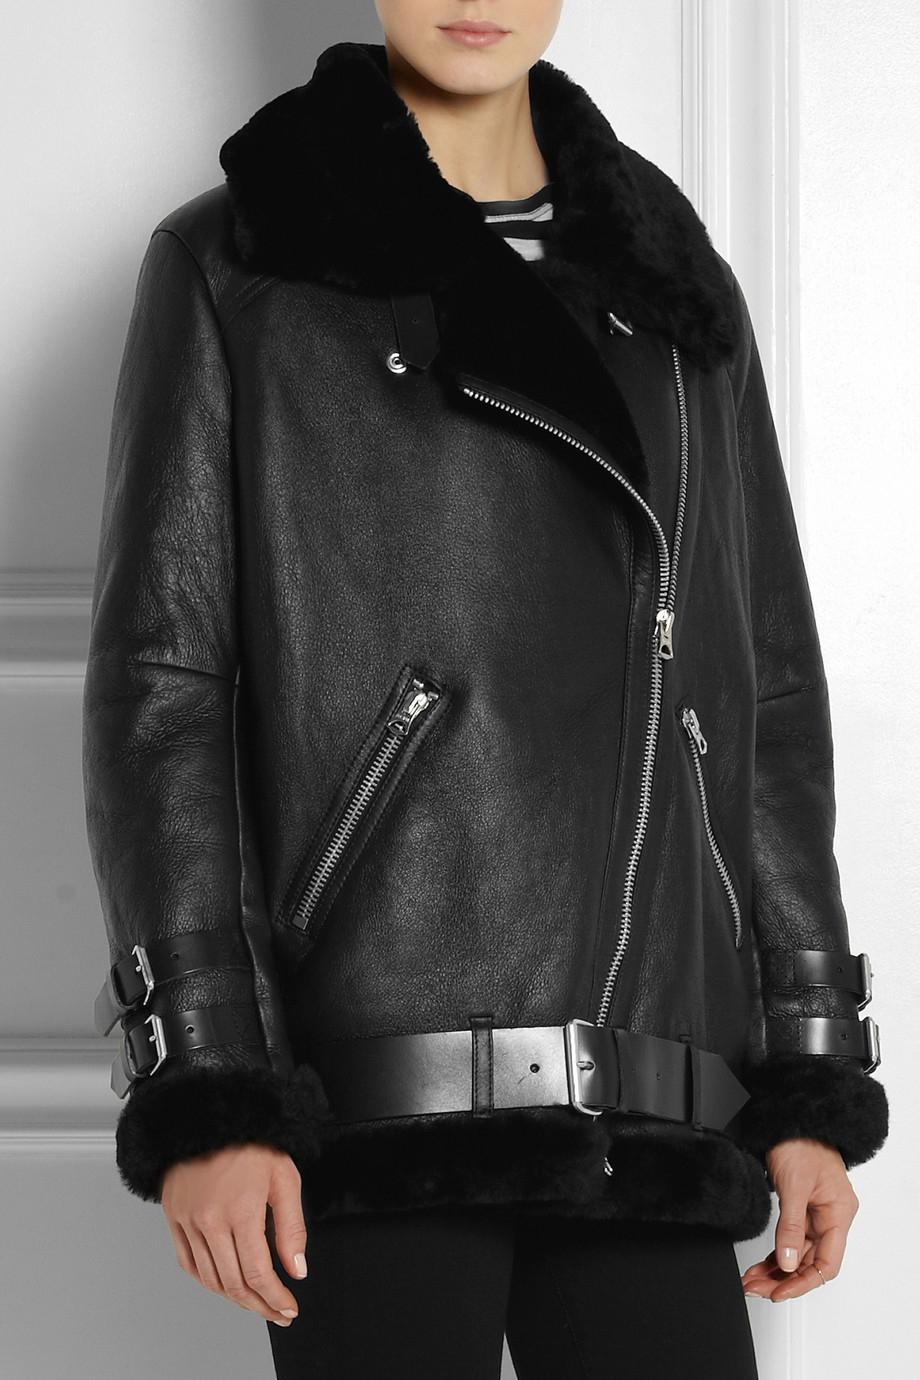 56e0d5c8b1369 Acne Studios Velocite Oversized Shearling Biker Jacket in Black - Lyst